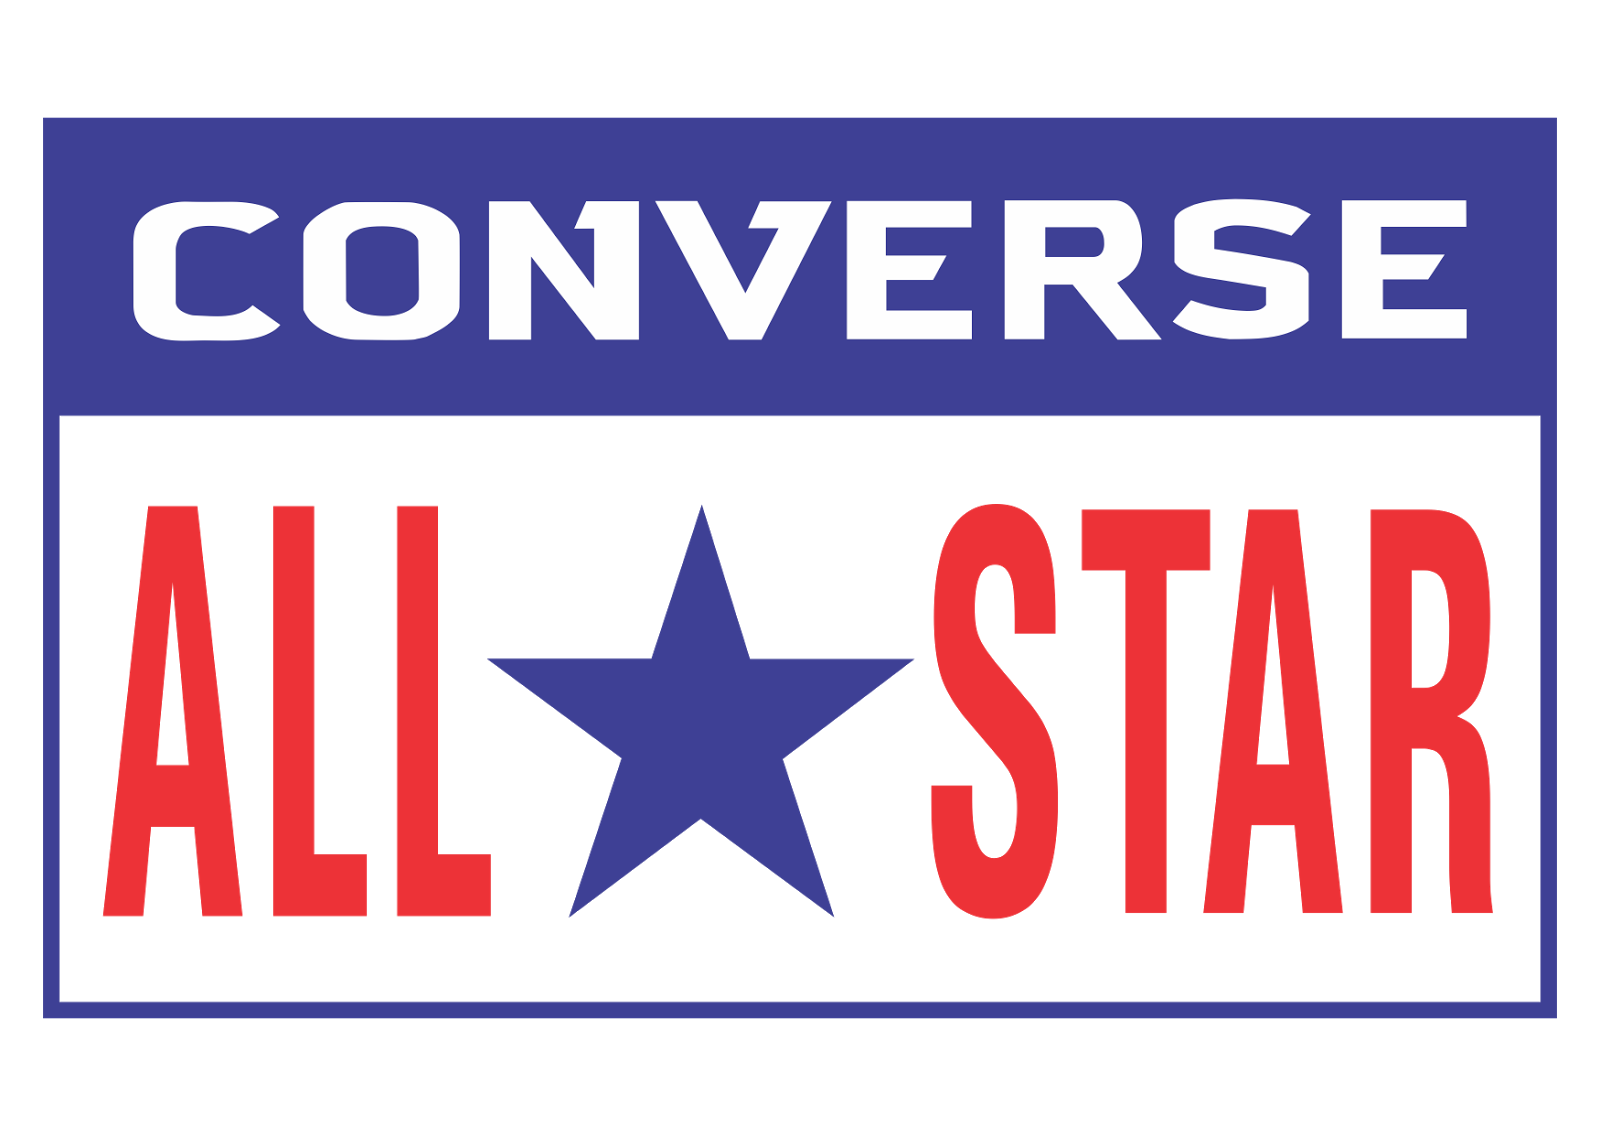 Converse All Star Logo Wallpaper